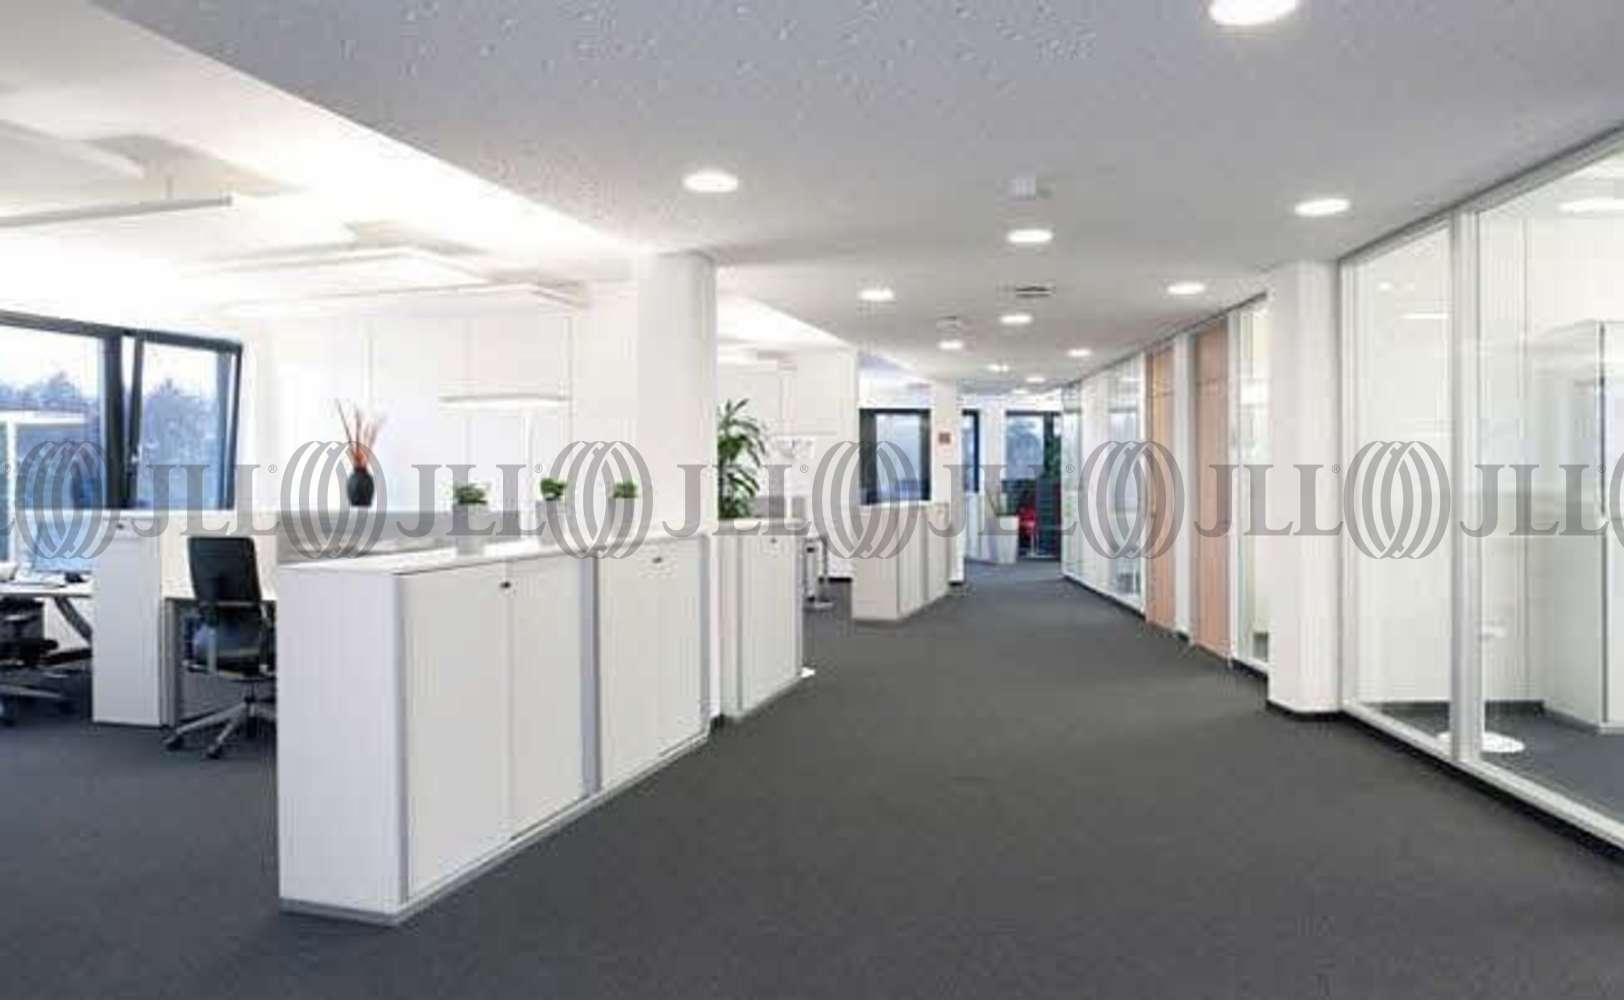 Büros Offenbach am main, 63067 - Büro - Offenbach am Main - F2312 - 10881974